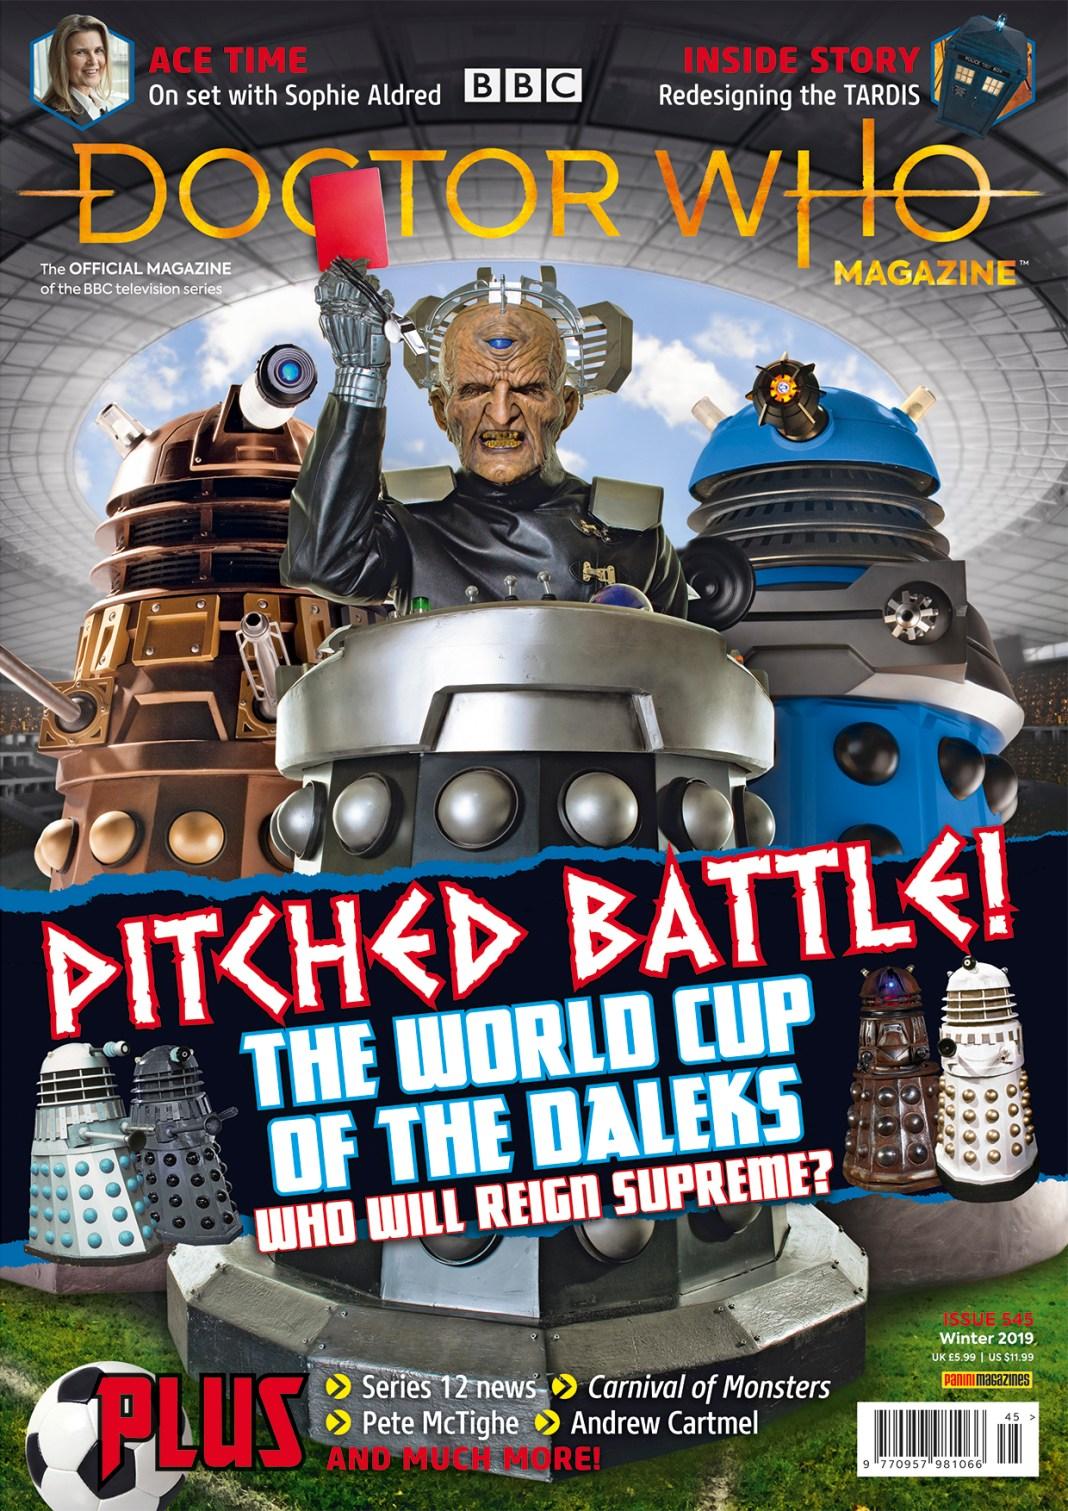 Doctor Who Magazine Issue 545 cover. (c) BBC Studios/Panini